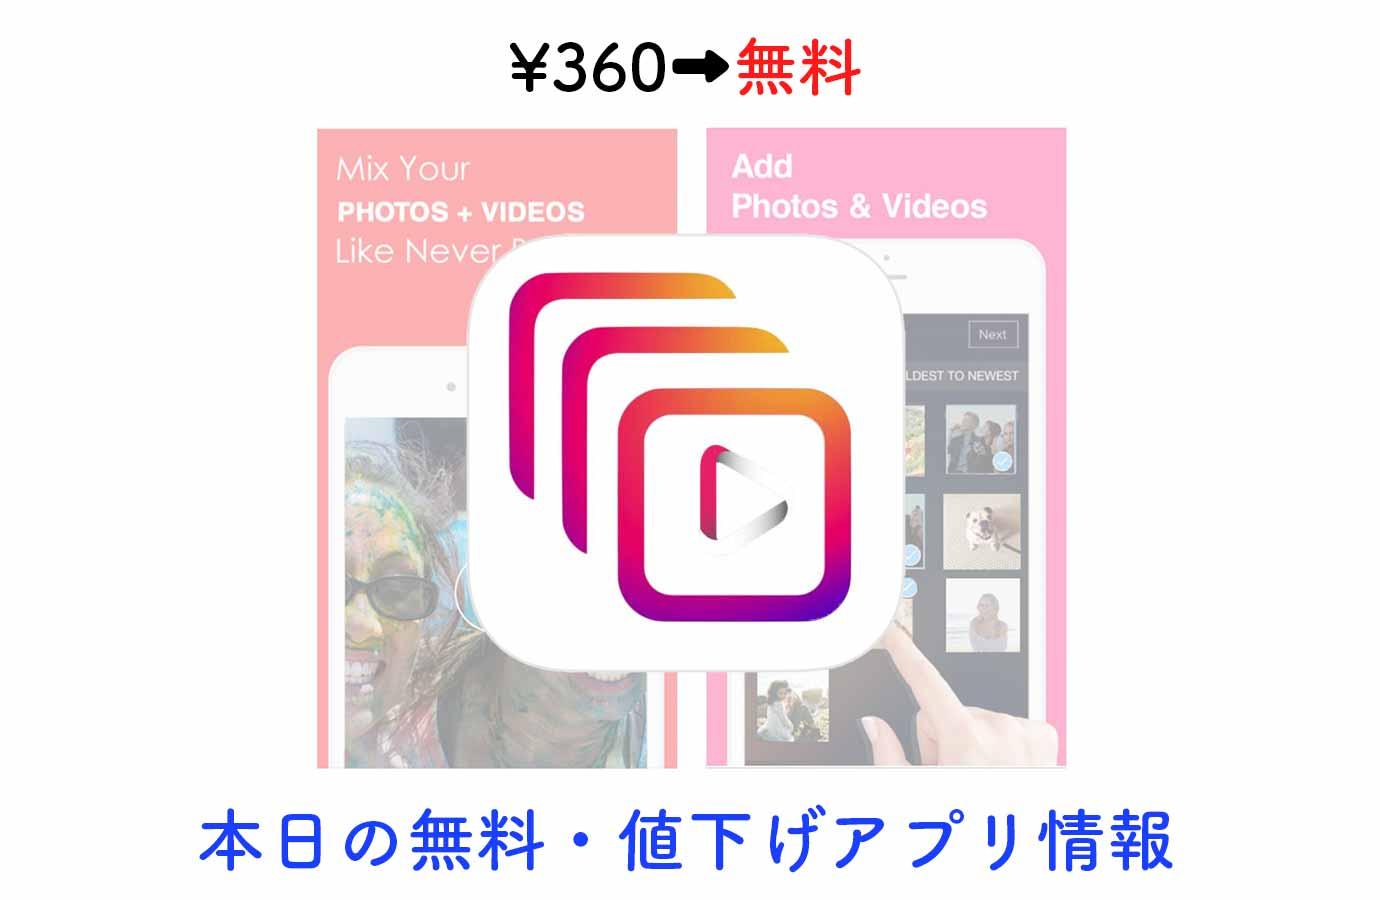 Appsale0920